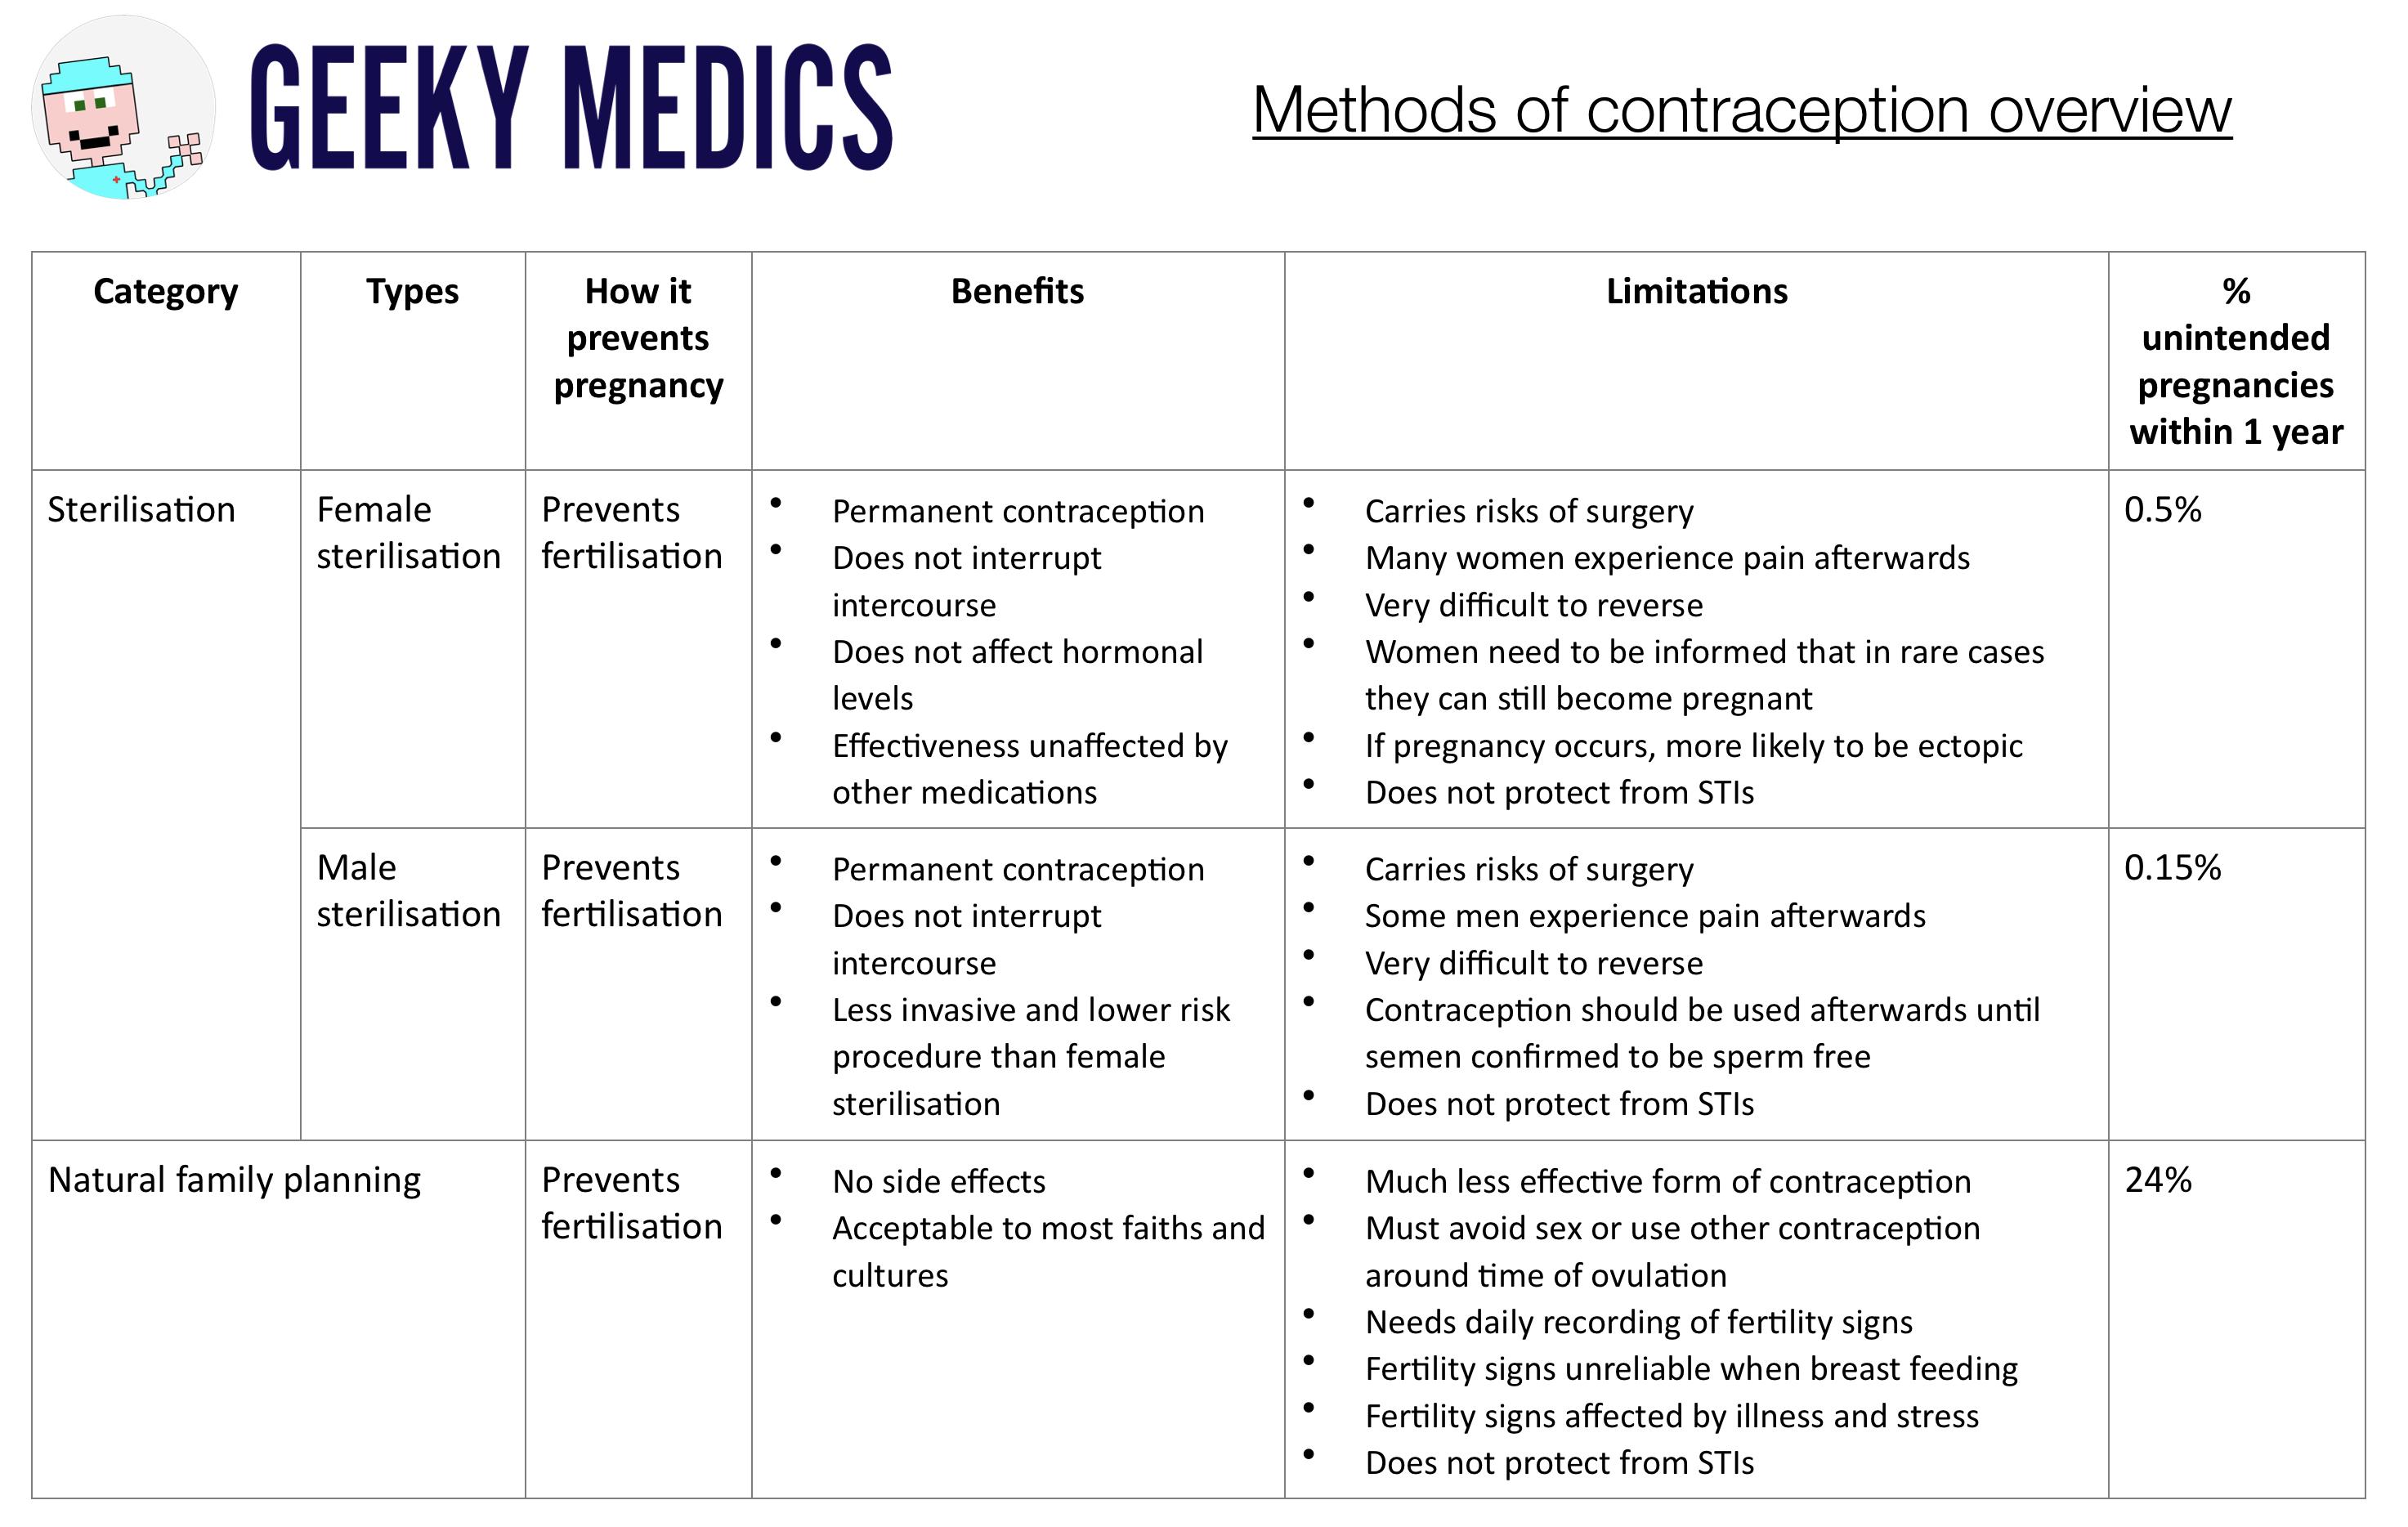 Methods Of Contraception Cocp Pop Larcs Geeky Medics